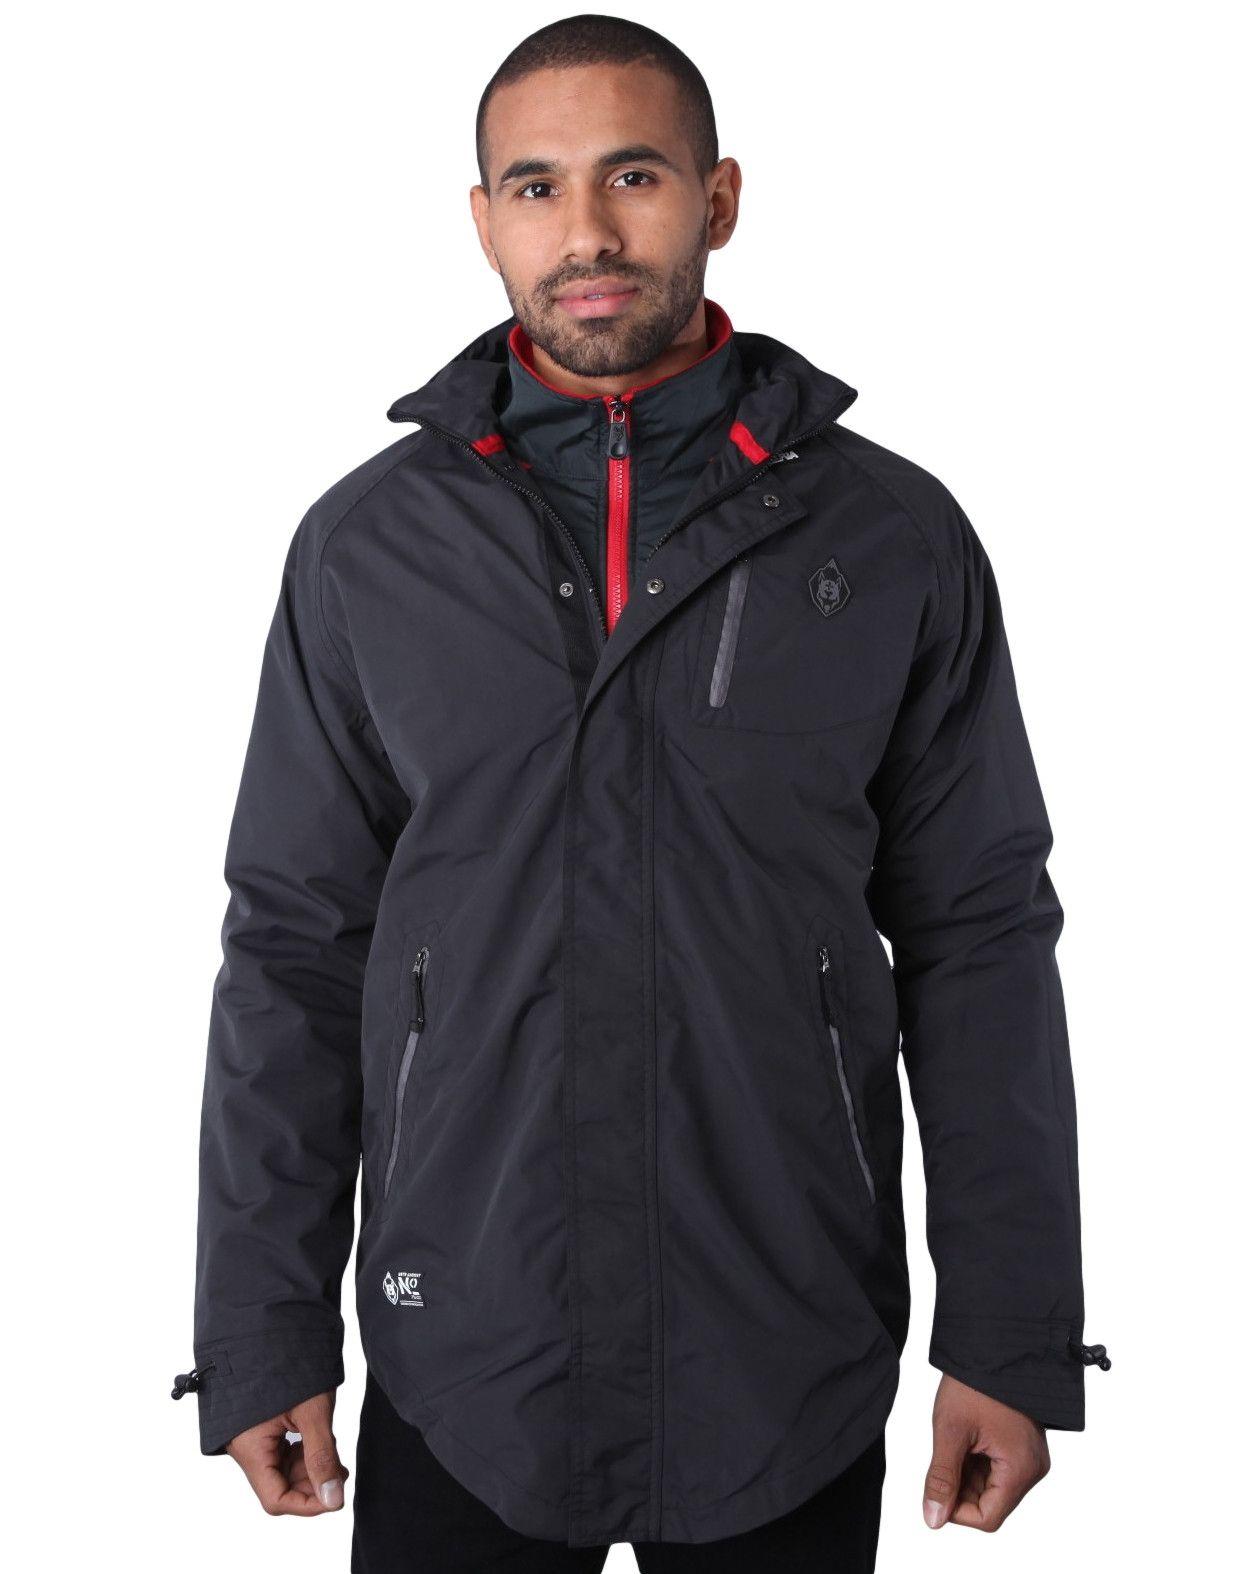 Psyberia Men's Internationalist Waterproof Nylon Jacket